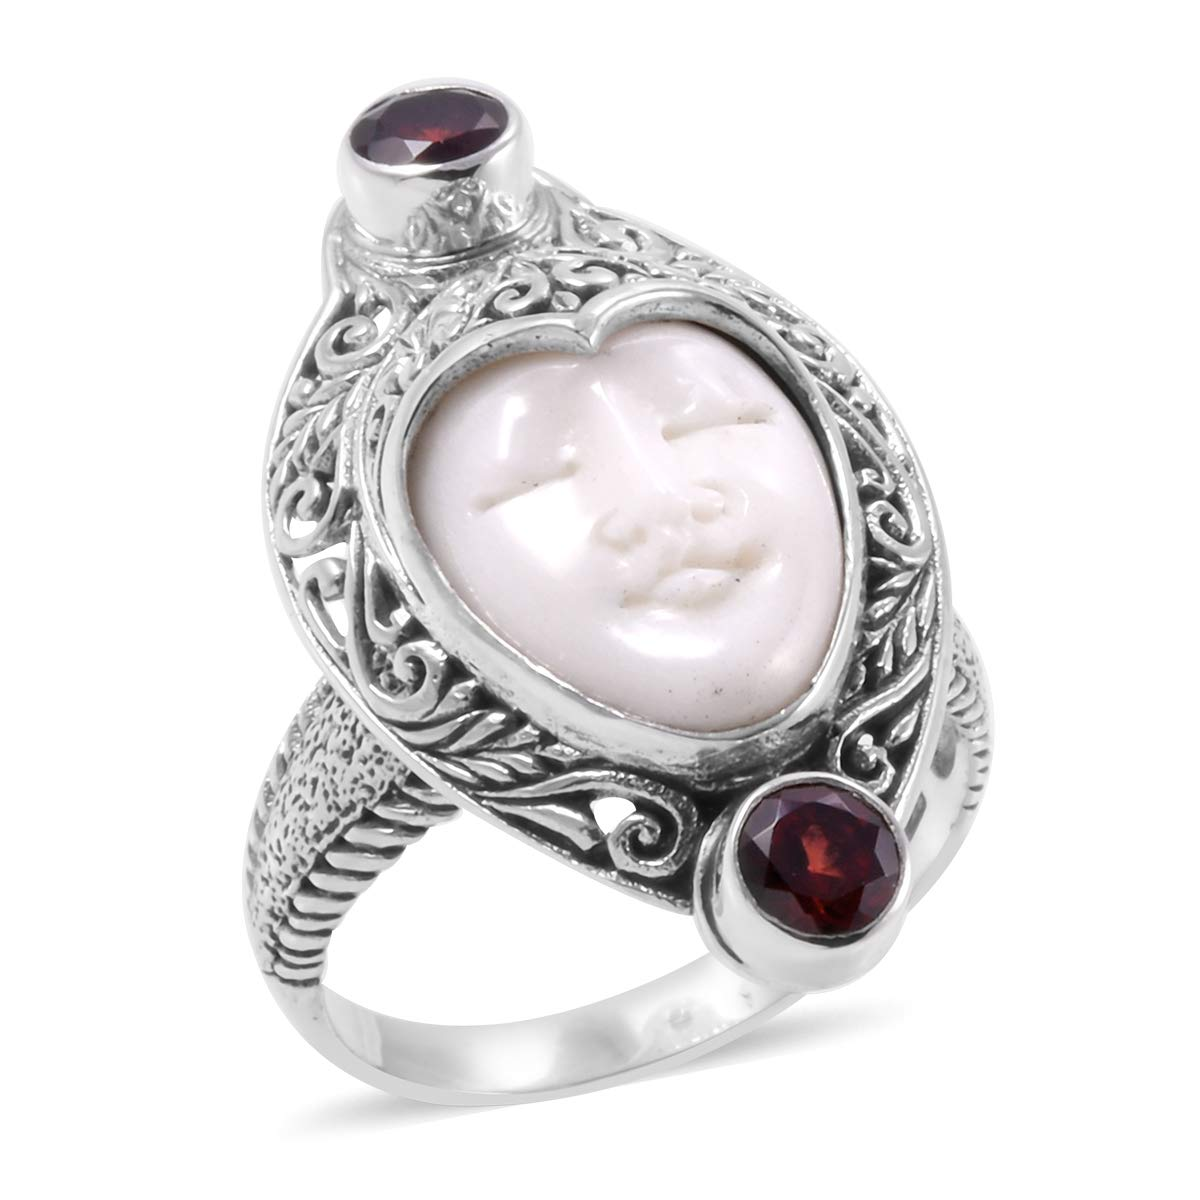 925 Sterling Silver Pear Ox Bone, Garnet Ring Size 8 by Shop LC